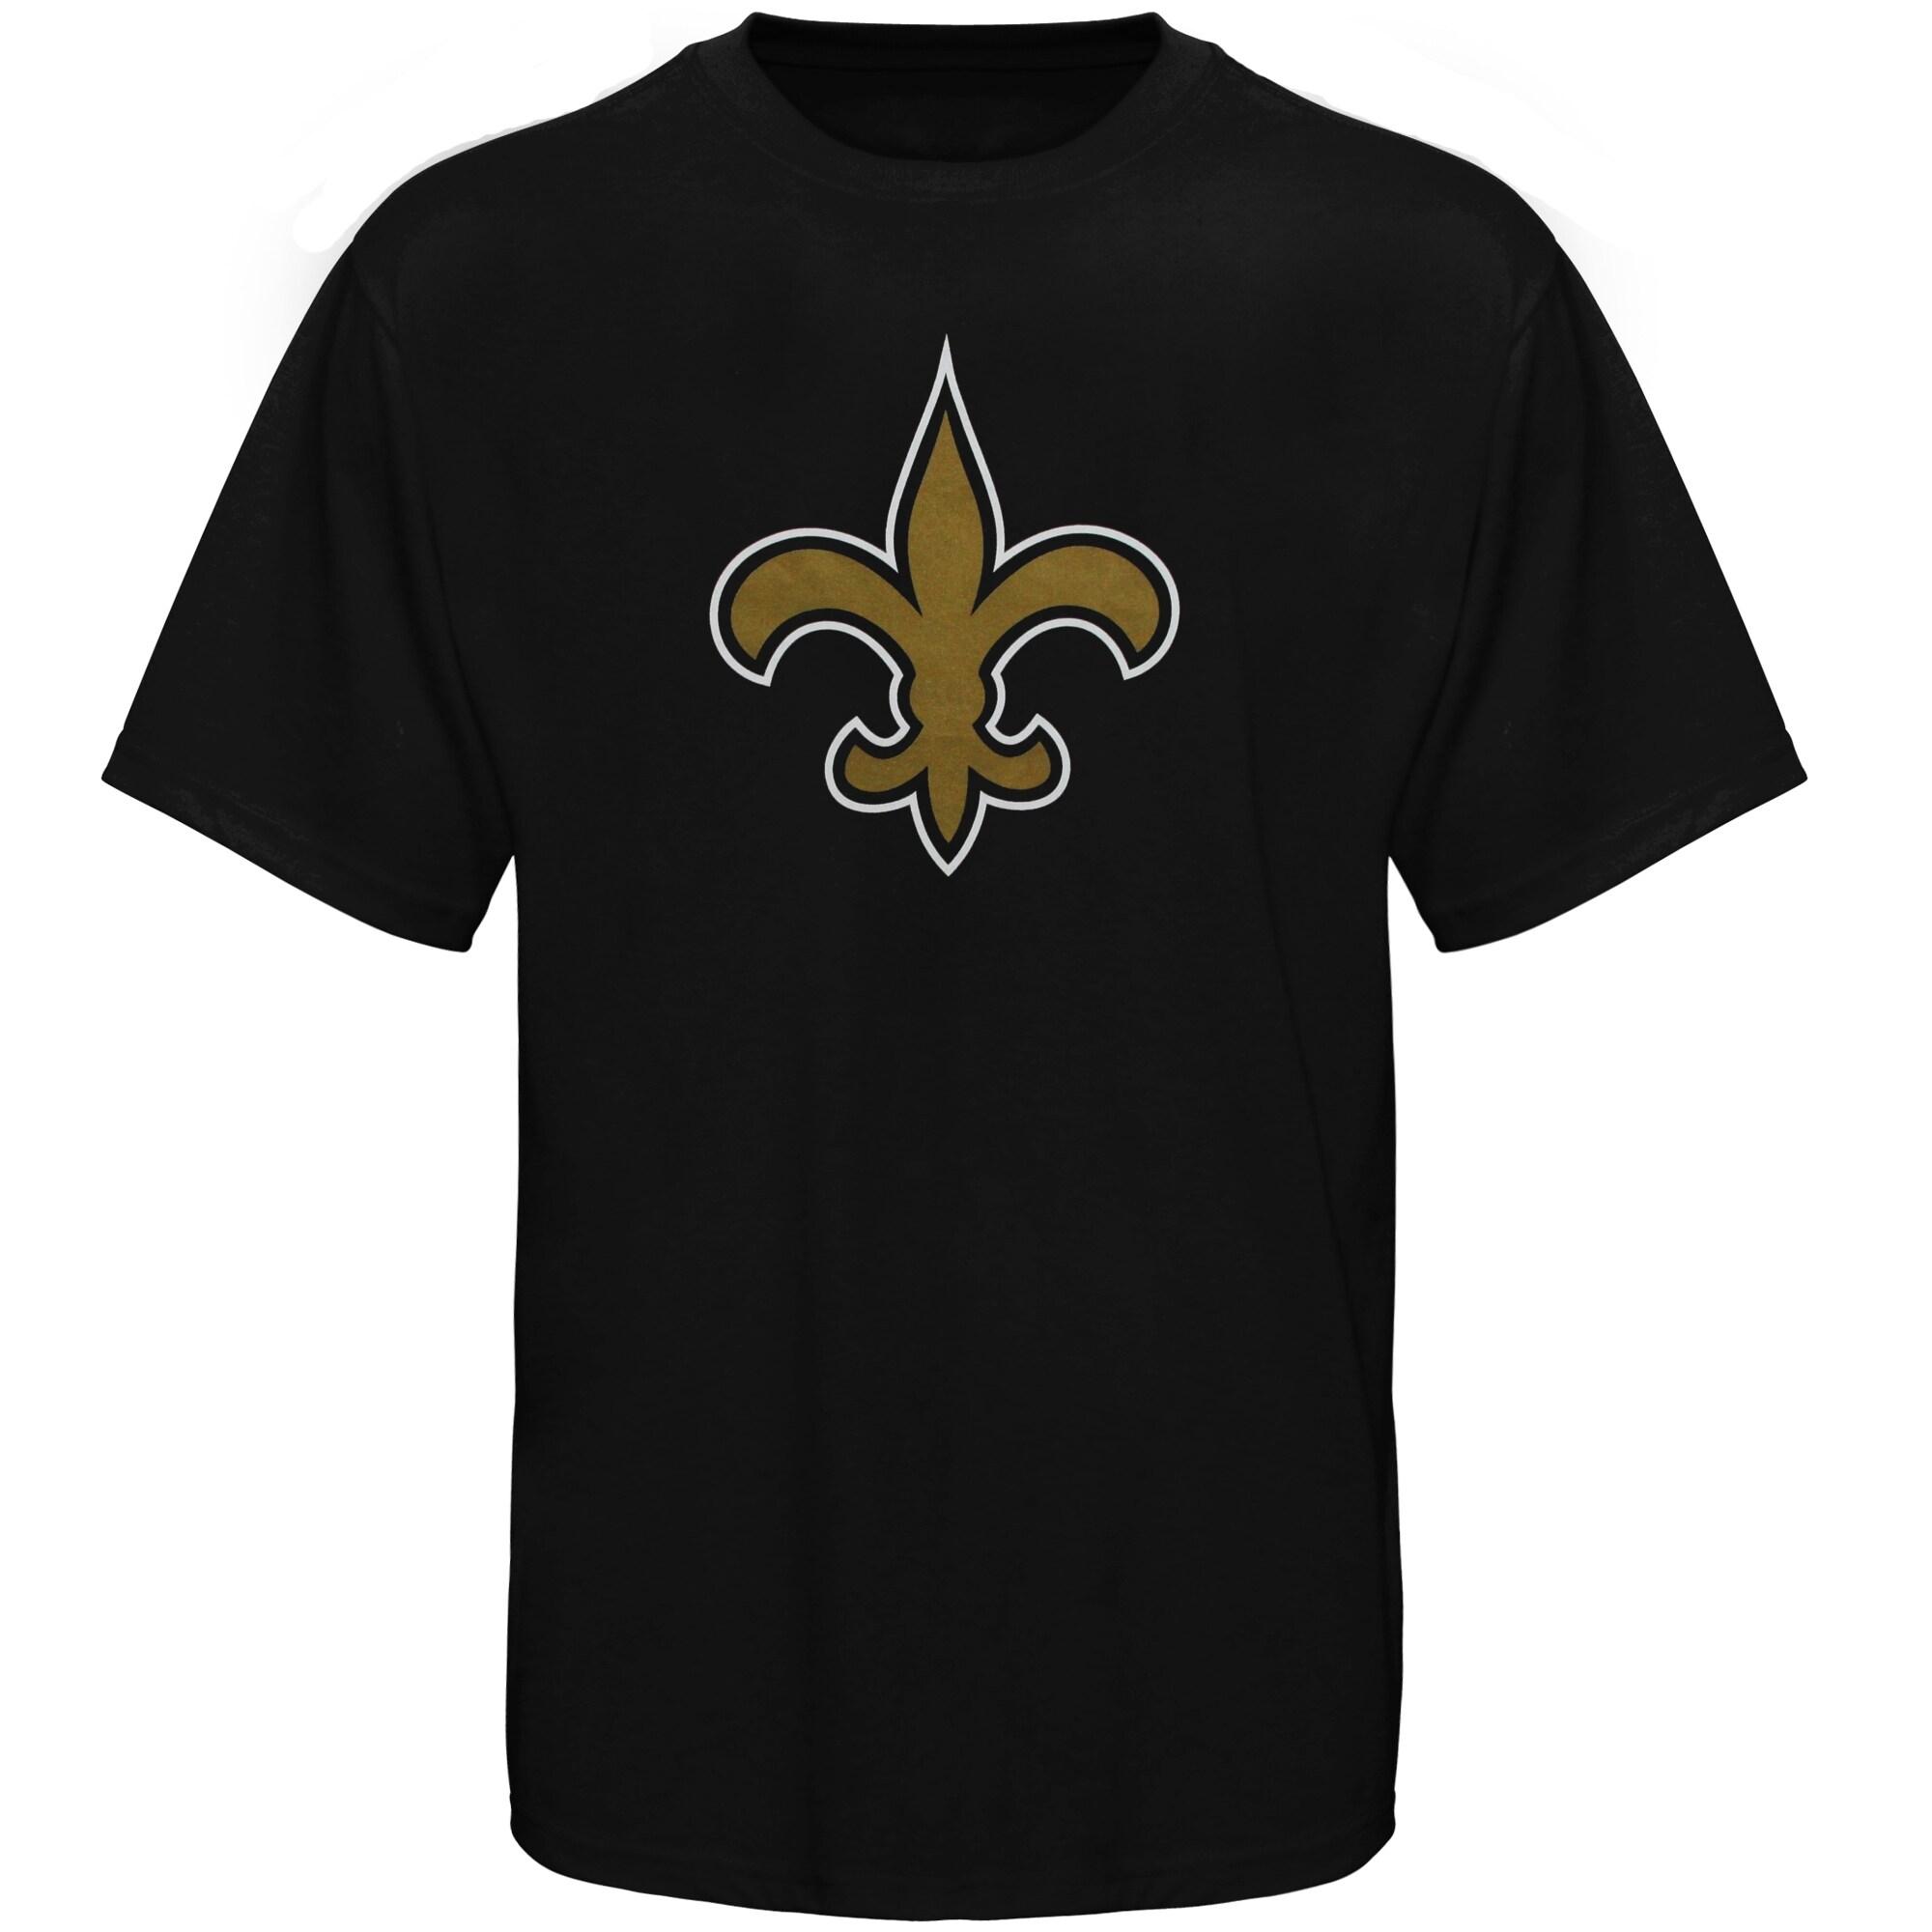 New Orleans Saints Youth Team Logo T-Shirt - Black